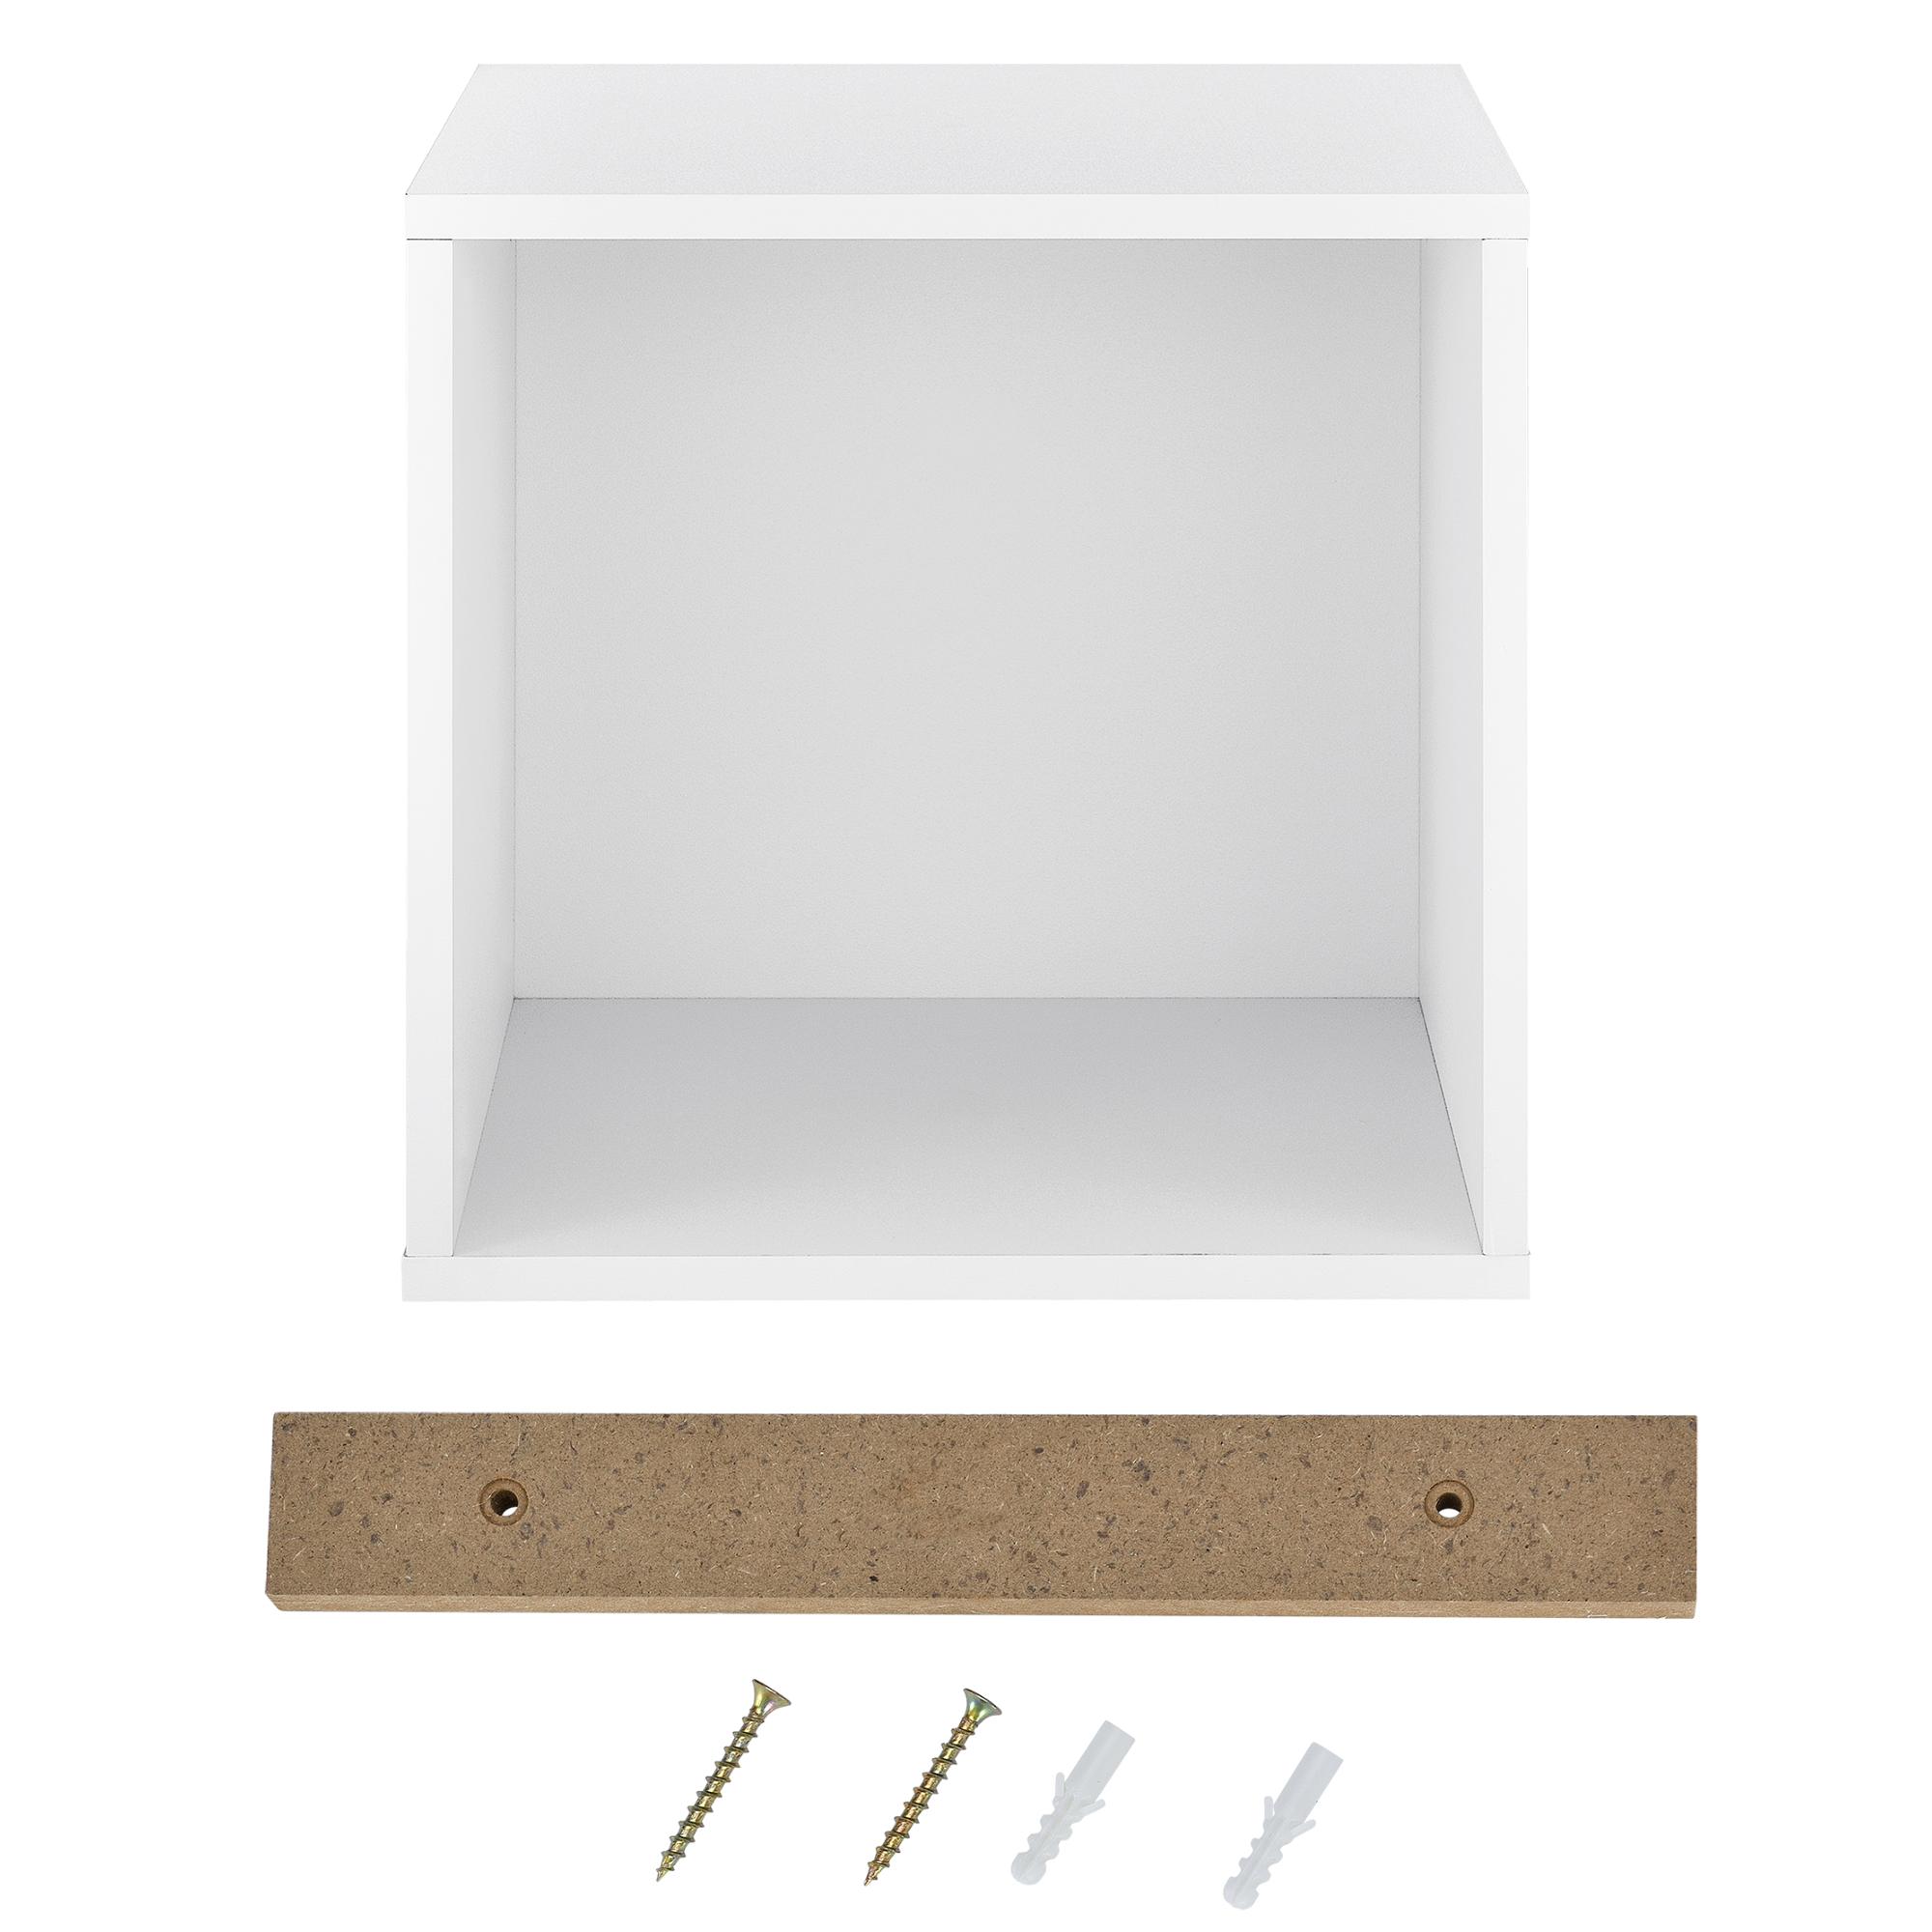 regal 30x30x30cm wei wandregal h ngeregal b cherregal kombinierbar ebay. Black Bedroom Furniture Sets. Home Design Ideas